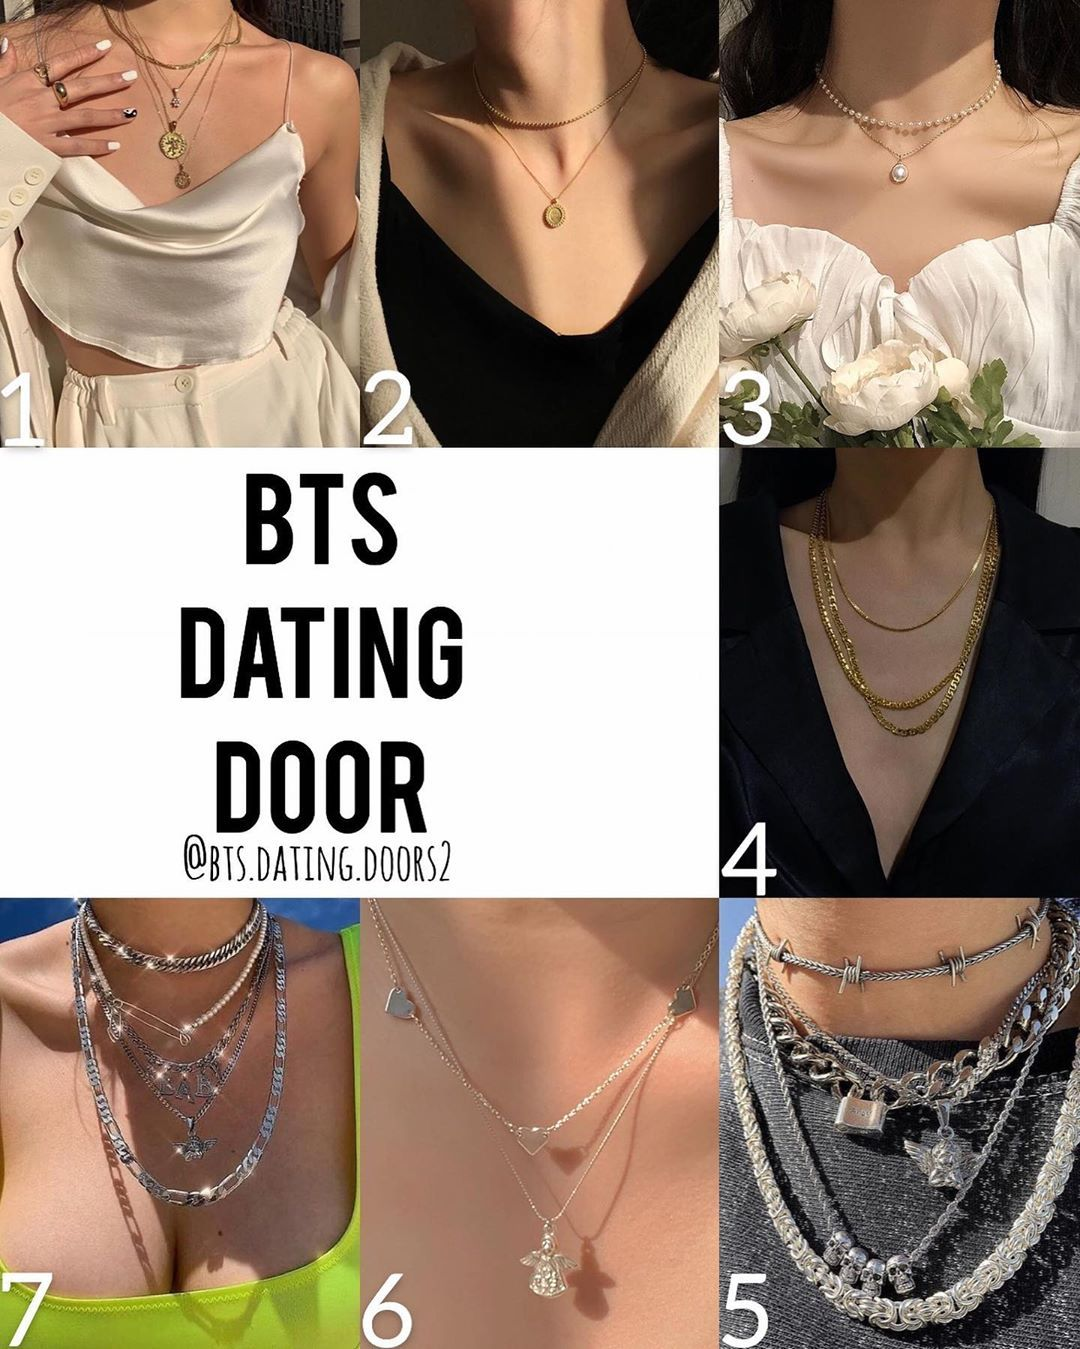 Which necklace is your favorite?🌟 swipe to see who you got🍃 : . : None of the photos used in my dating doors are mine. Credit for all the photos used in my dating doors goes to the original creators. : #bangtansonyeondan #bangtan #bangtanboys #bts #방탄소년단 #btsdatingdoors #kimnamjoon #kimseokjin #minyoongi #junghoseok #parkjimin #kimtaehyung #jeonjungkook #rm #jin #suga #jhope #jimin #taehyung #jungkook #btsdatingdoor #kpop #army #kpopdatingdoors #jewelry #necklace